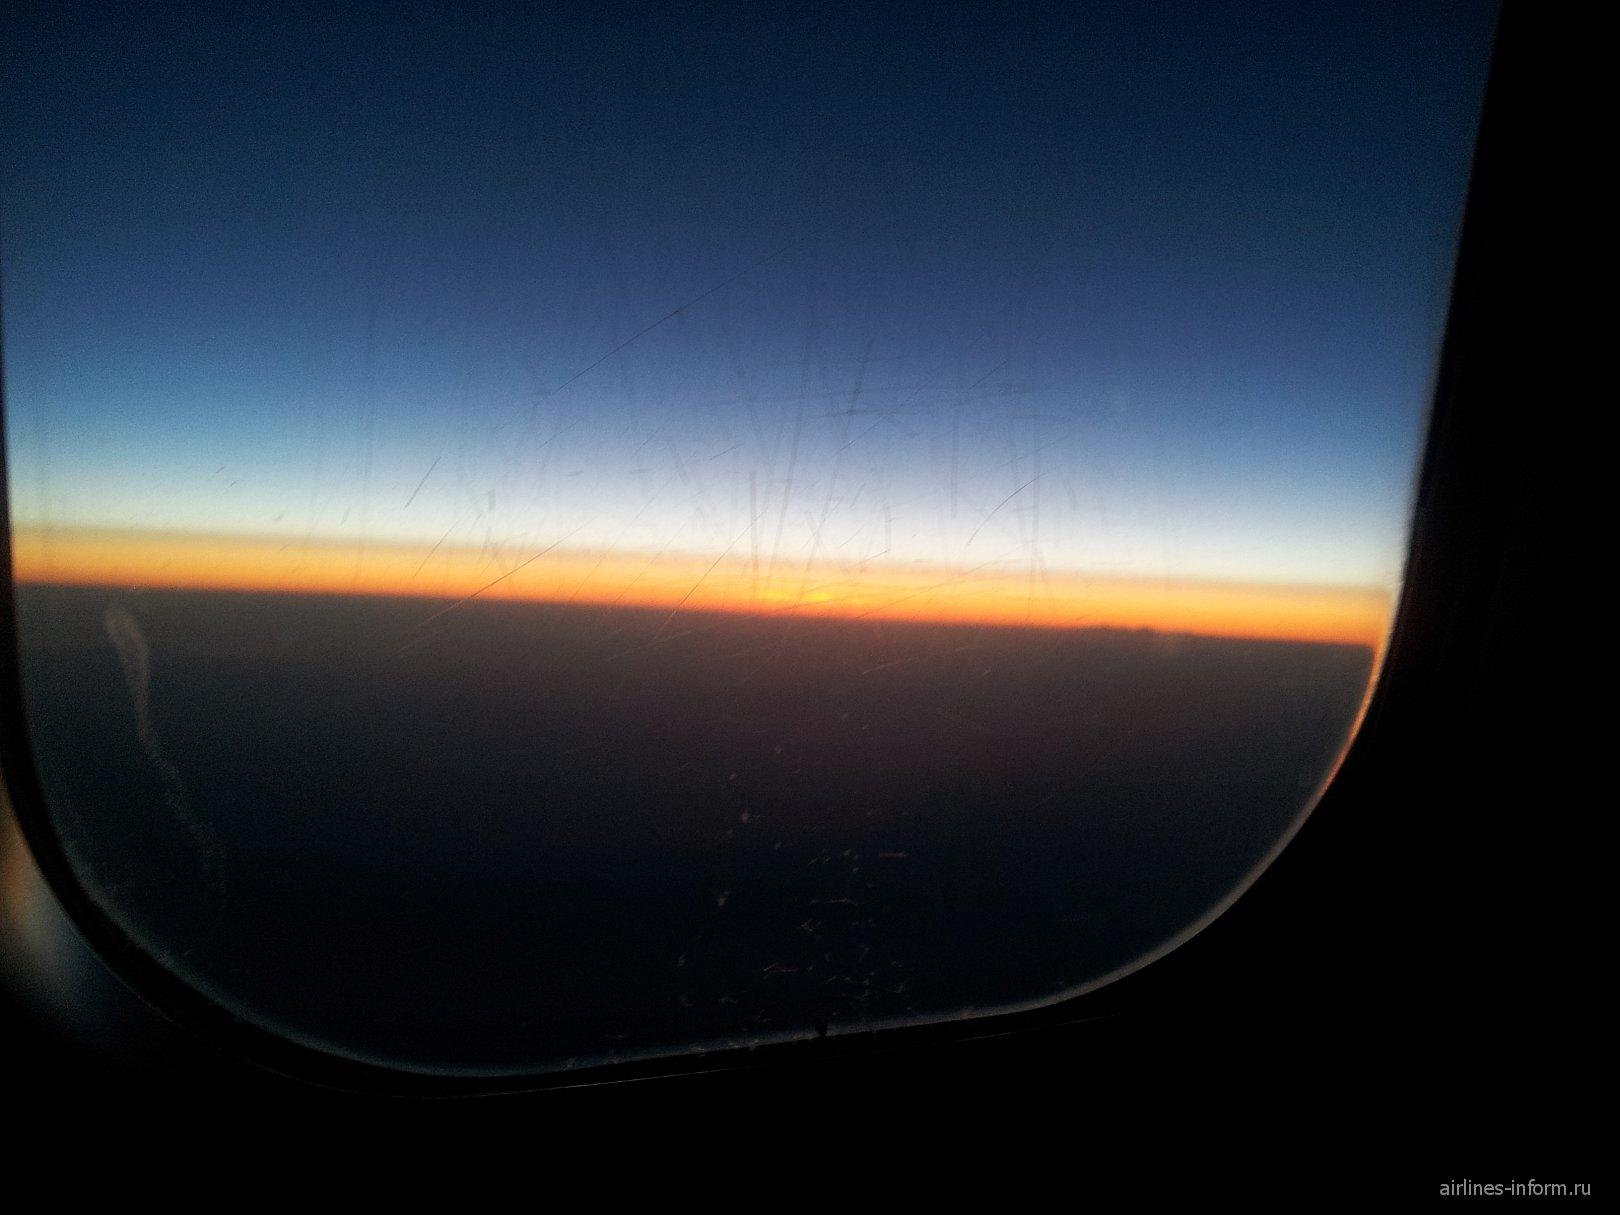 Рейс Лондон-Хитроу авиакомпании British Airways